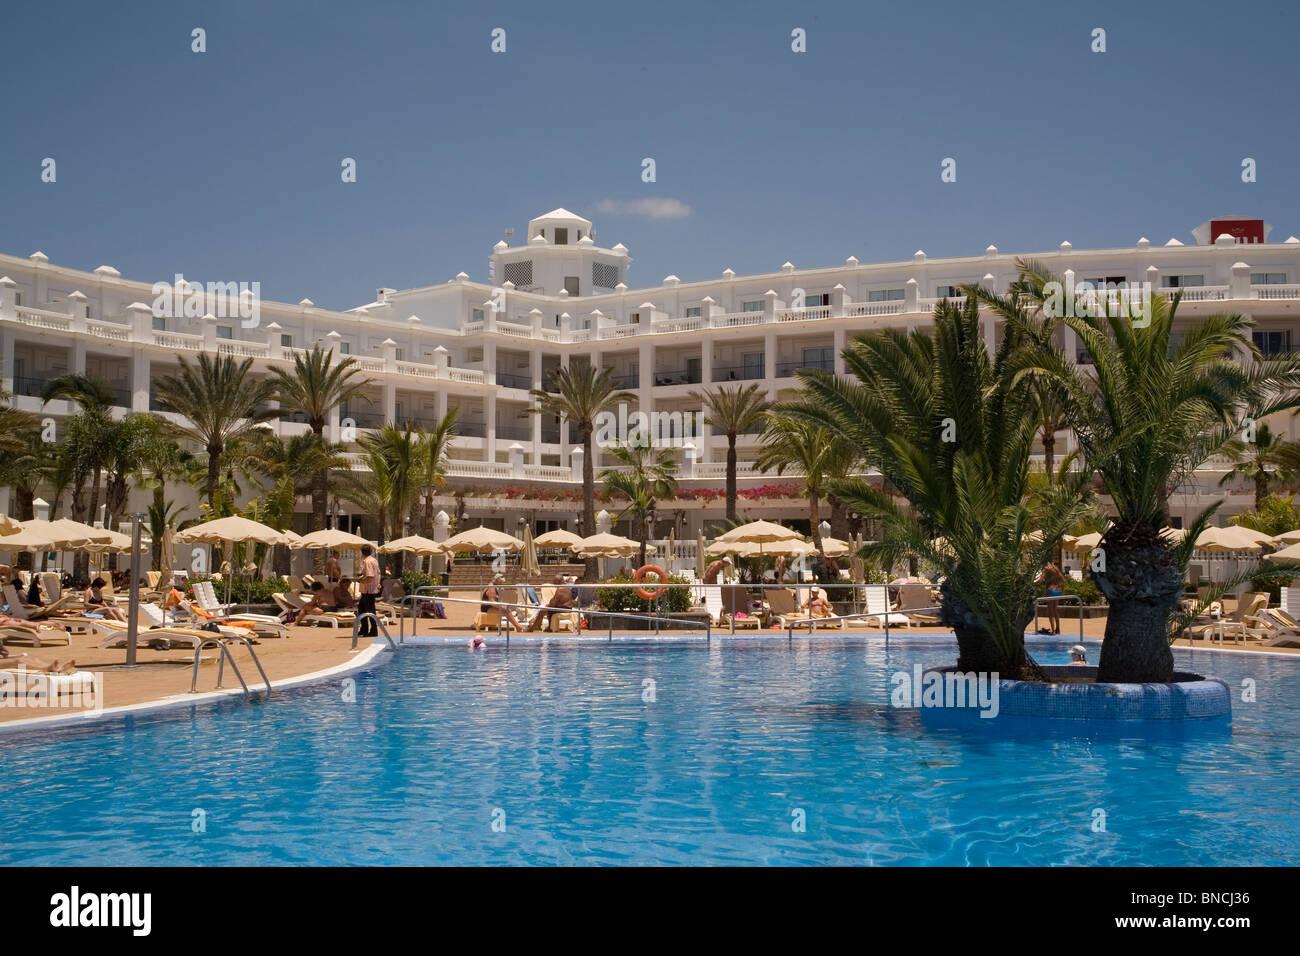 Spanien Kanaren Gran Canaria Playa Ingles Hotel Riu am Eingang zu den Dünen von Maspalomas Stockbild